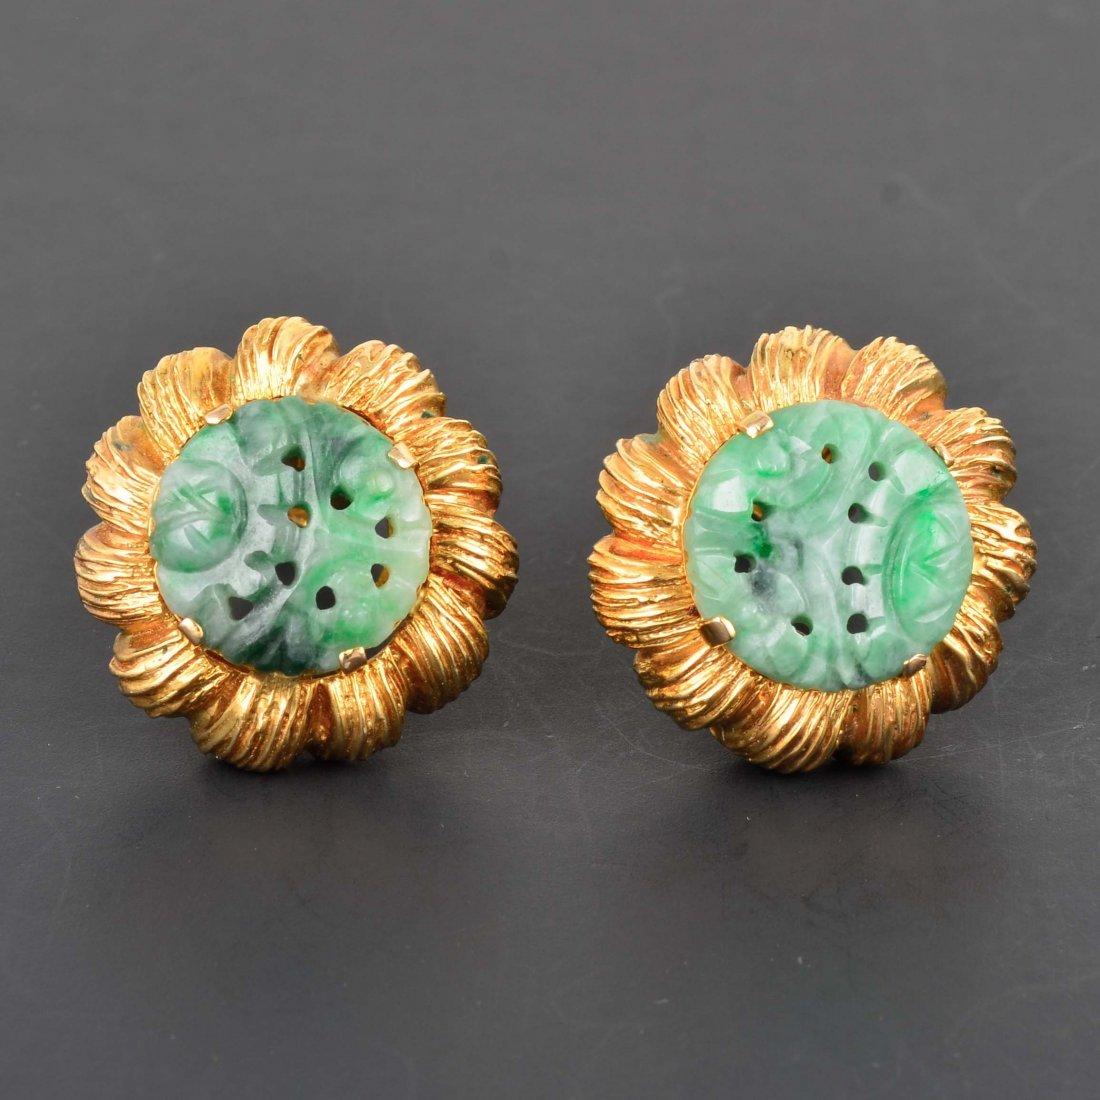 14K YG Carved Jadeite Clip-On Earrings